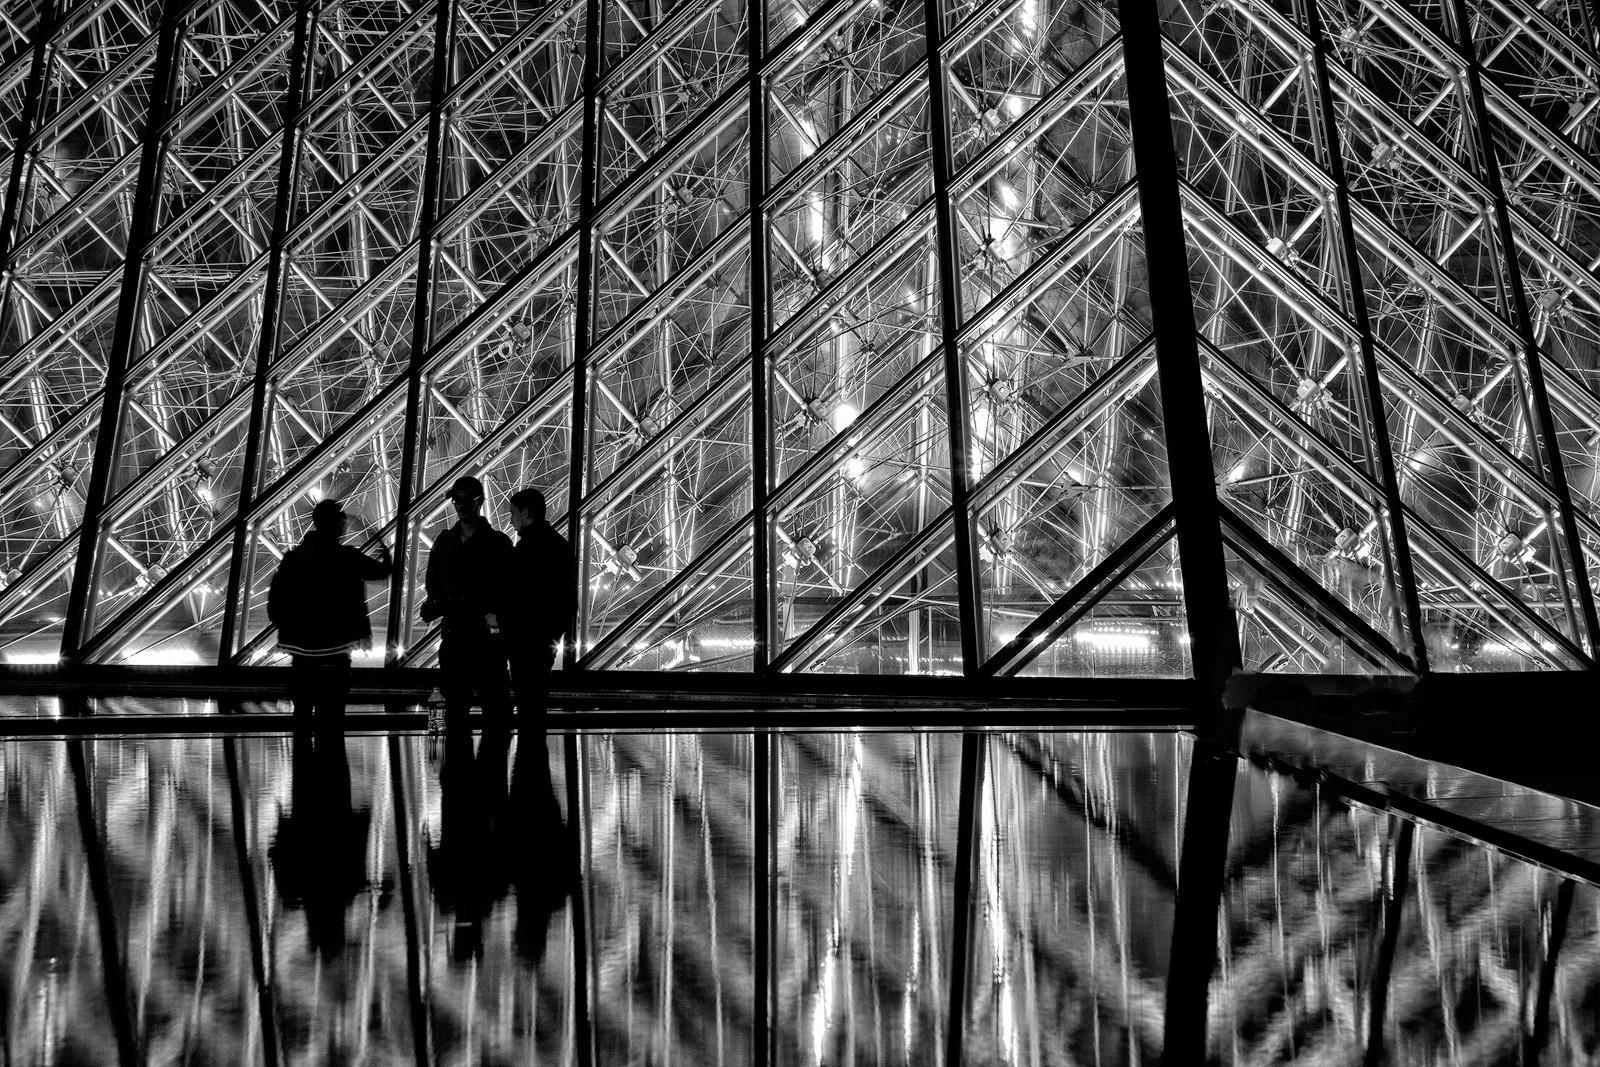 black & white,black and white,building,city scape,cityscape,entrance,europe,france,horizontal,louvre,night,paris,pyramid,structure parts,black & whi, photo